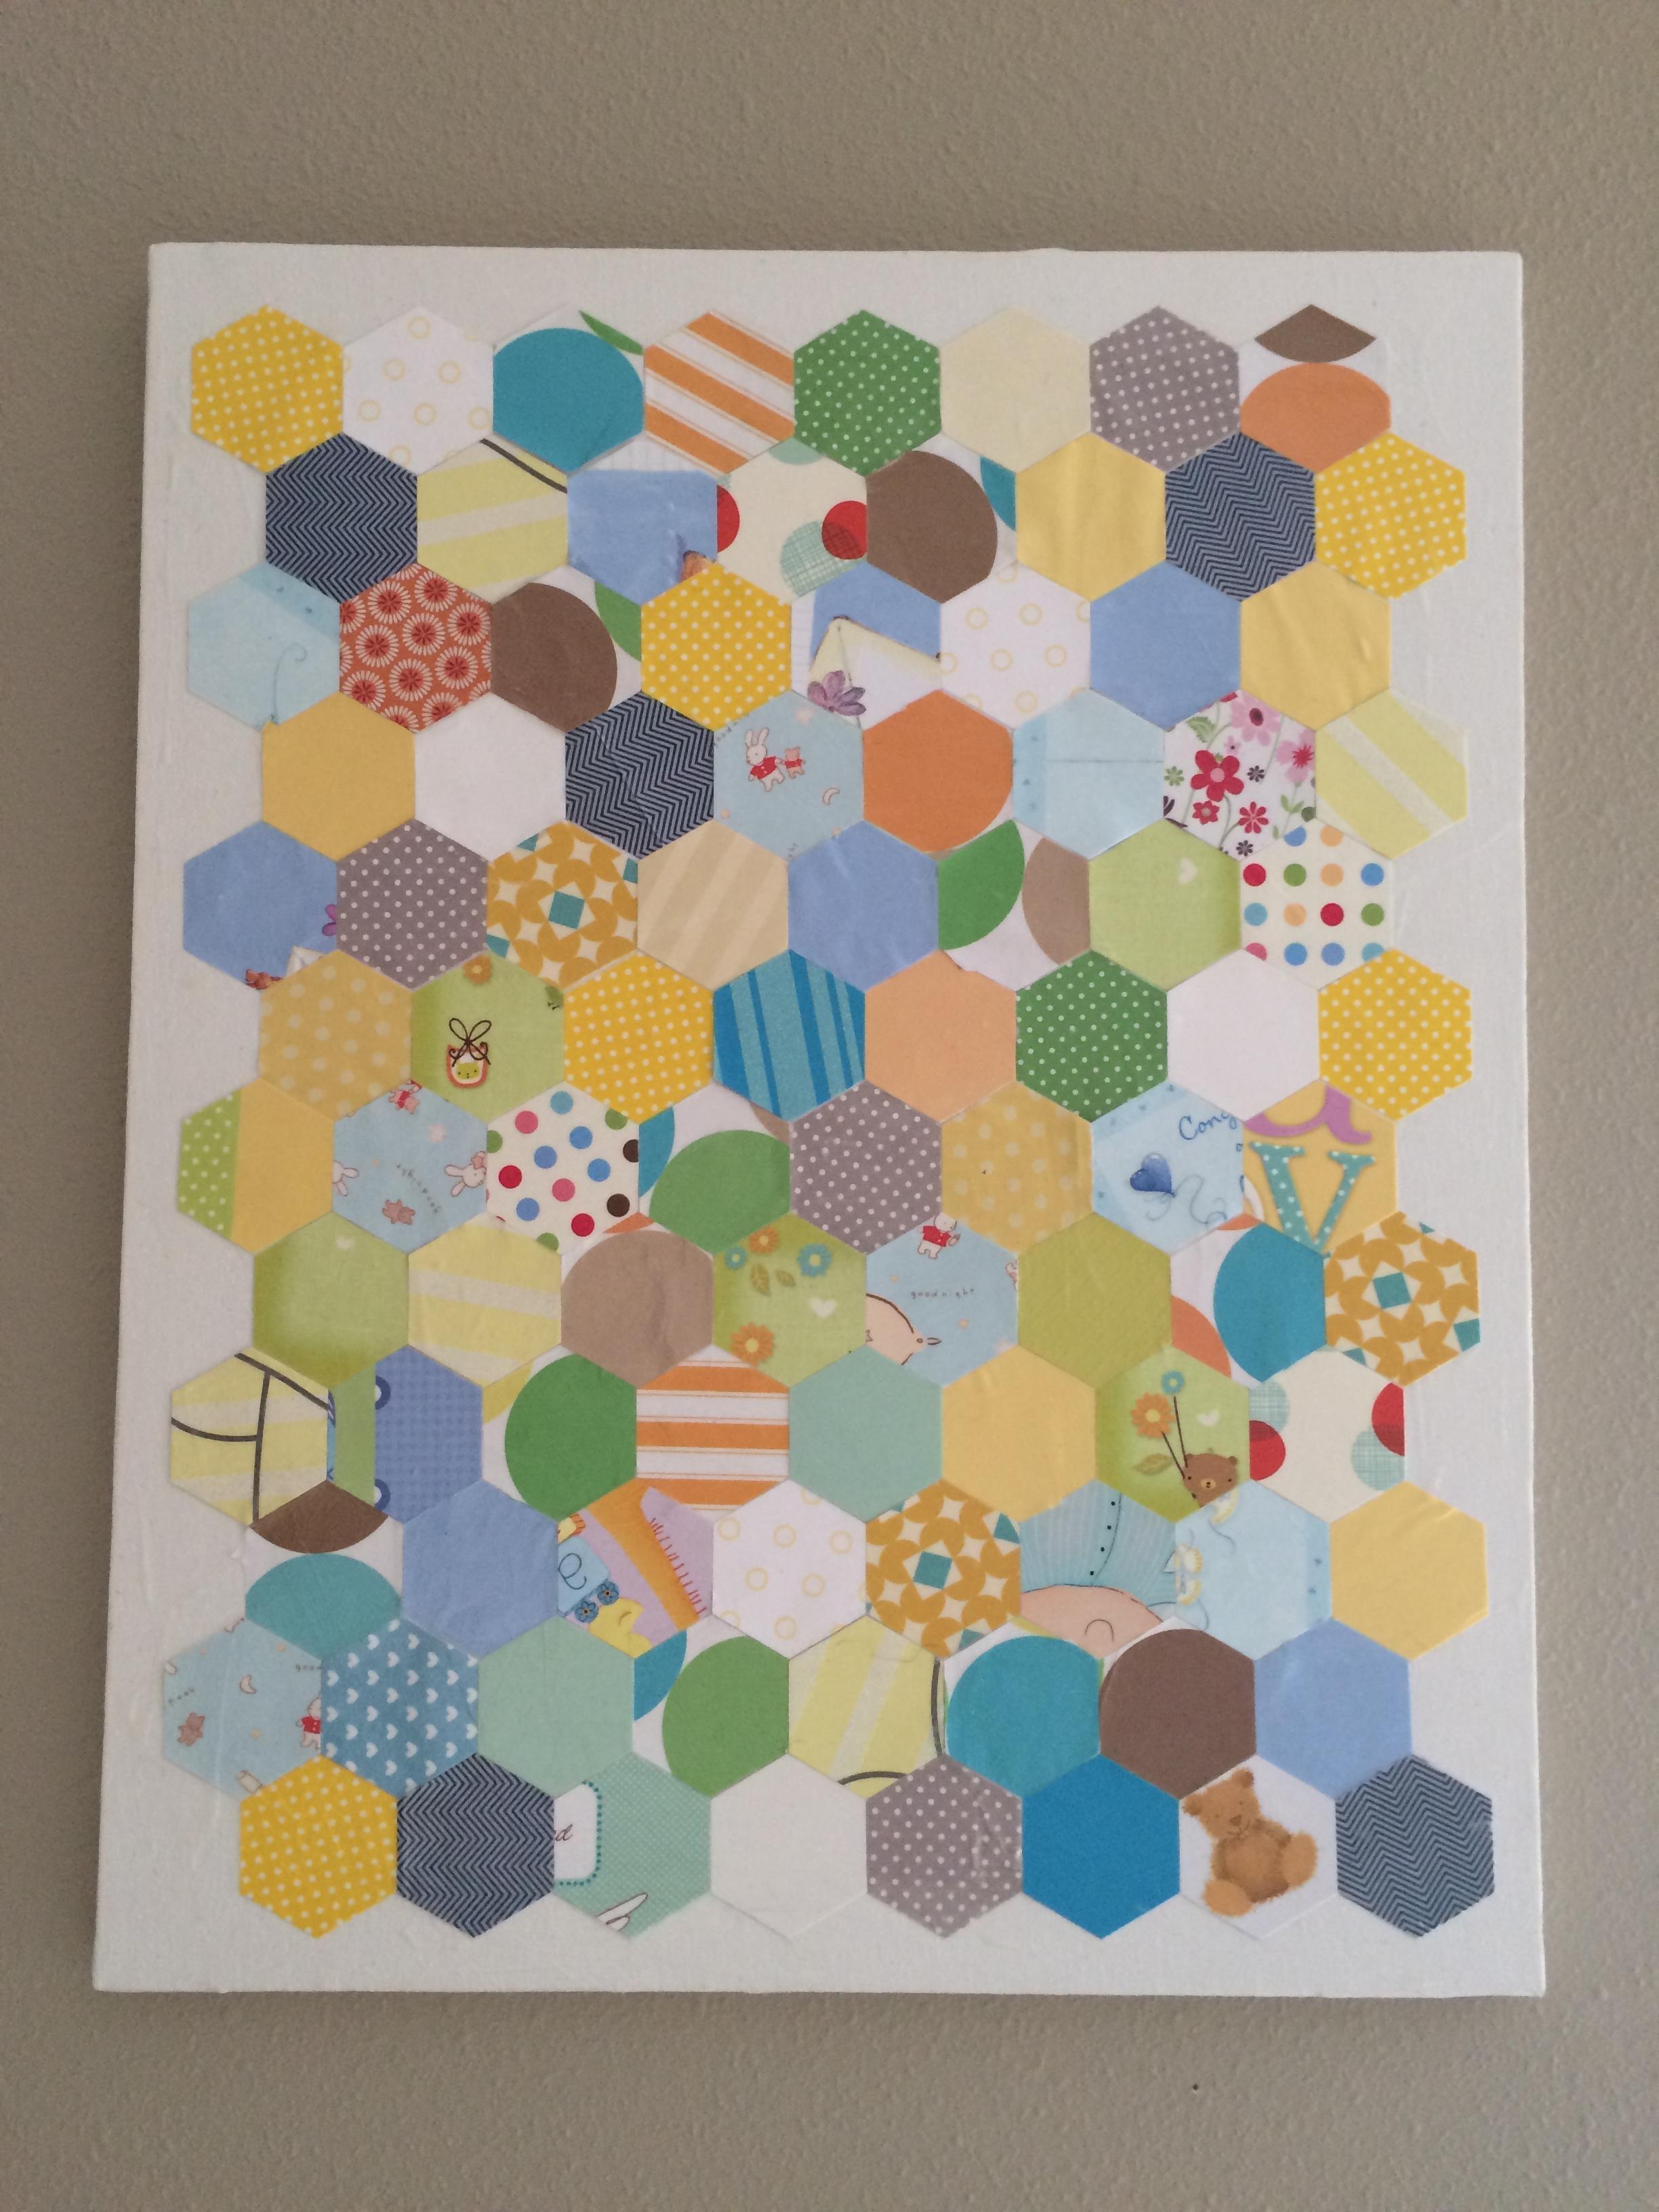 Fresh Nursery Wall Art Ideas: Decoupage, Glue, Sew And Staple Within Decoupage Wall Art (Image 9 of 20)